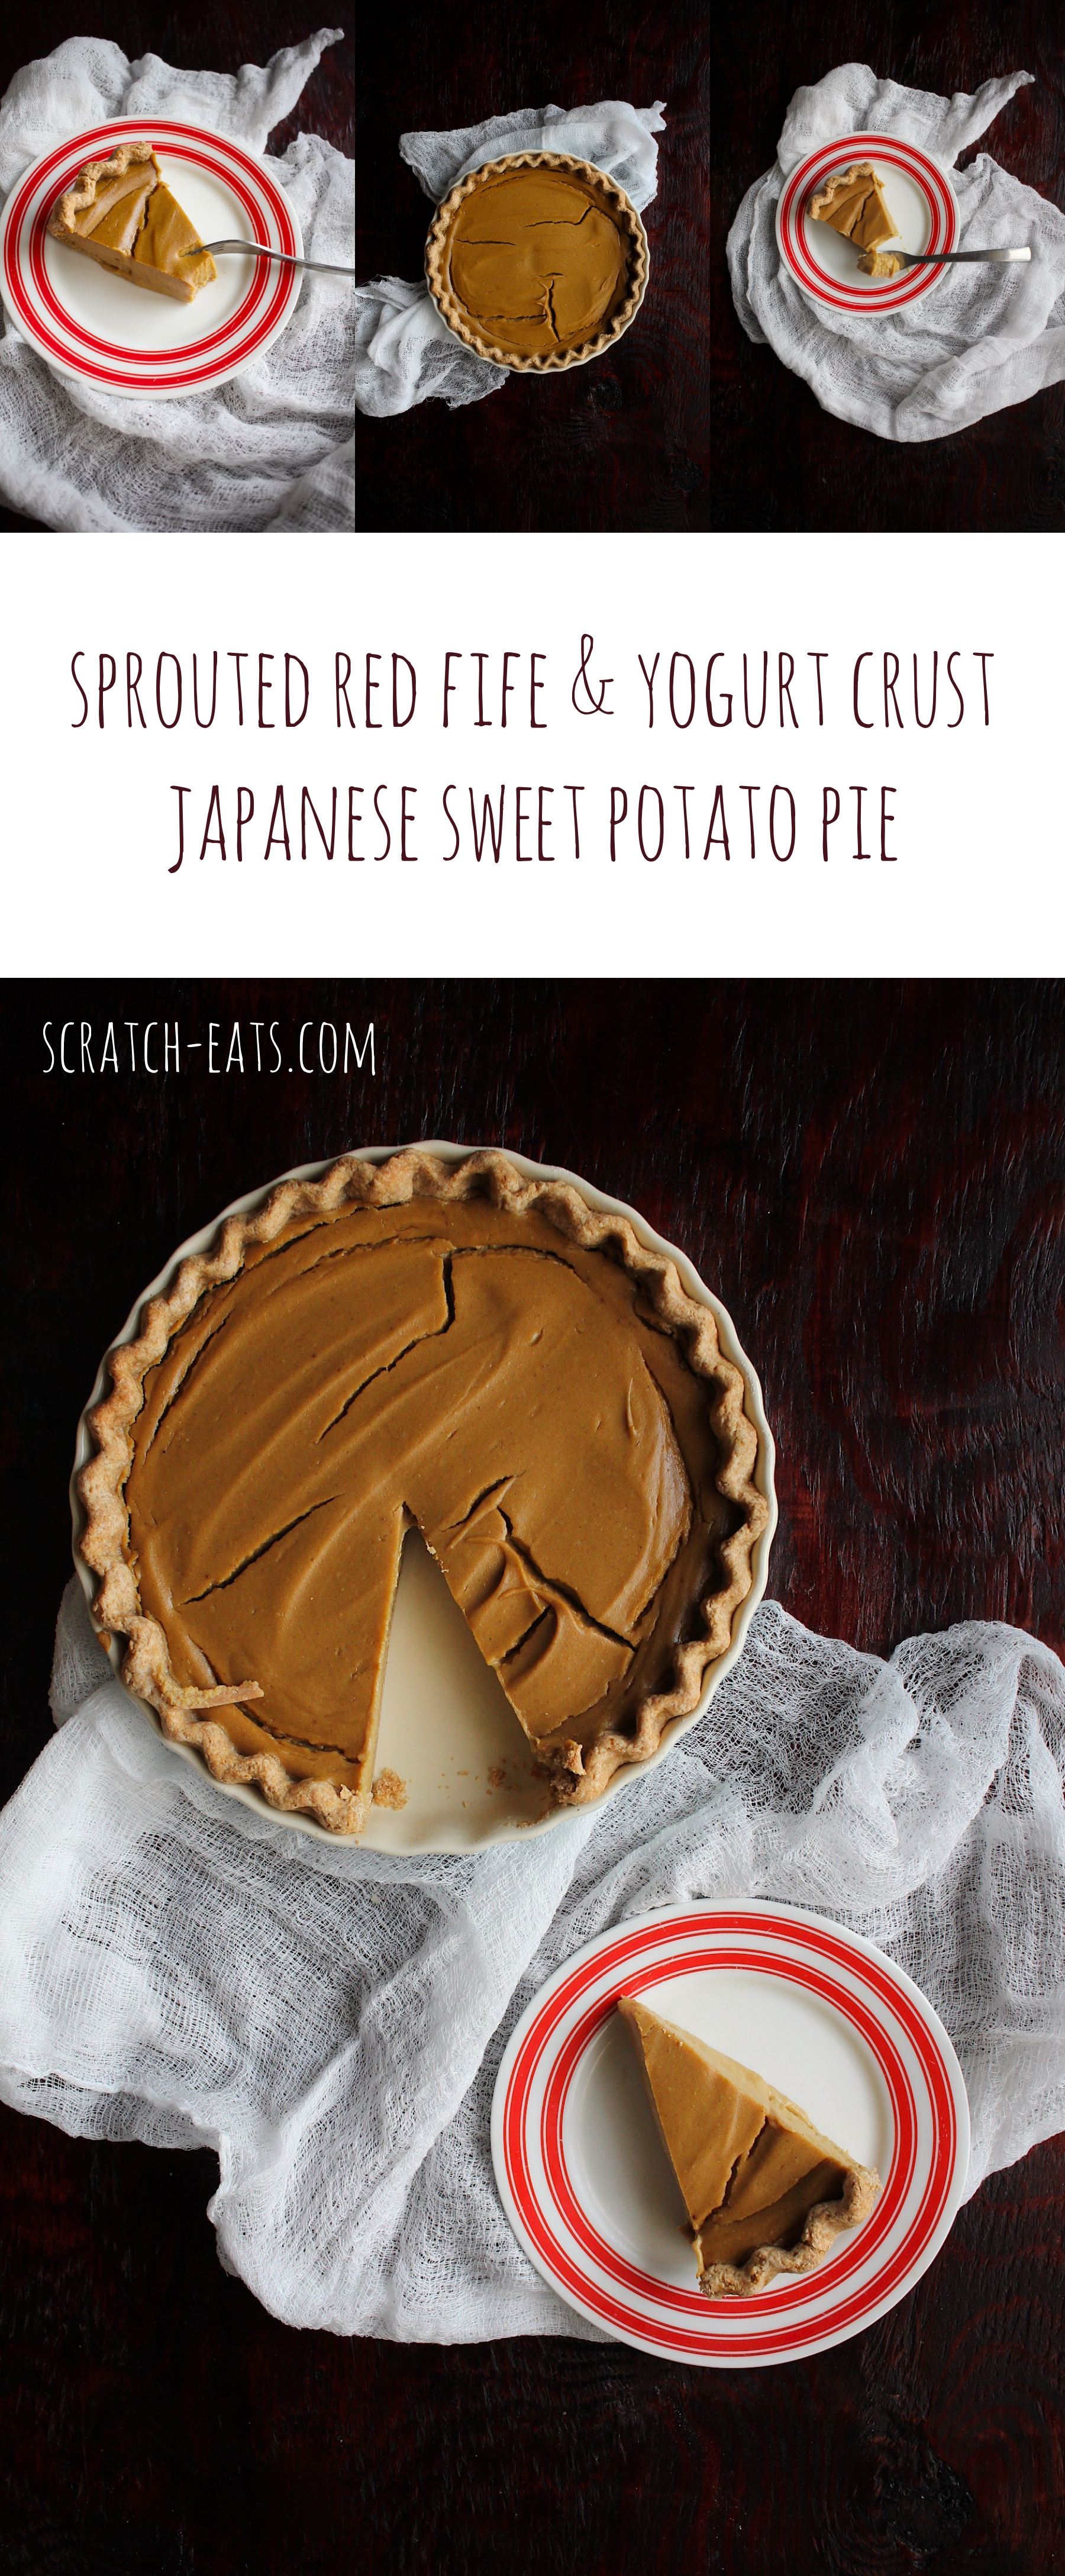 Sprouted Red Fife & Yogurt Crust Japanese Sweet Potato Pie